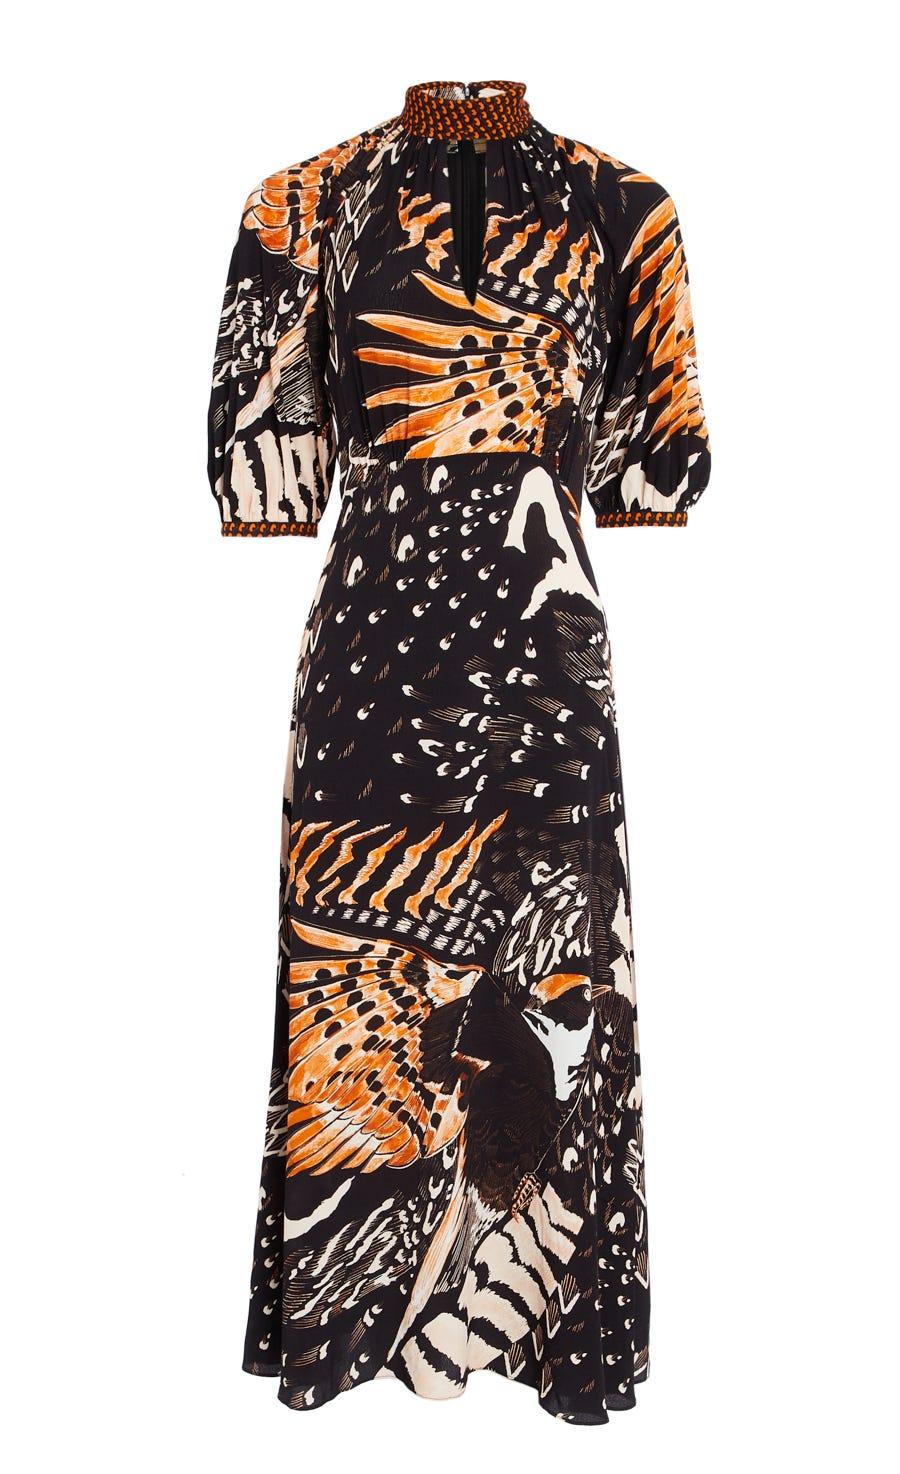 Rosella Bird Dress